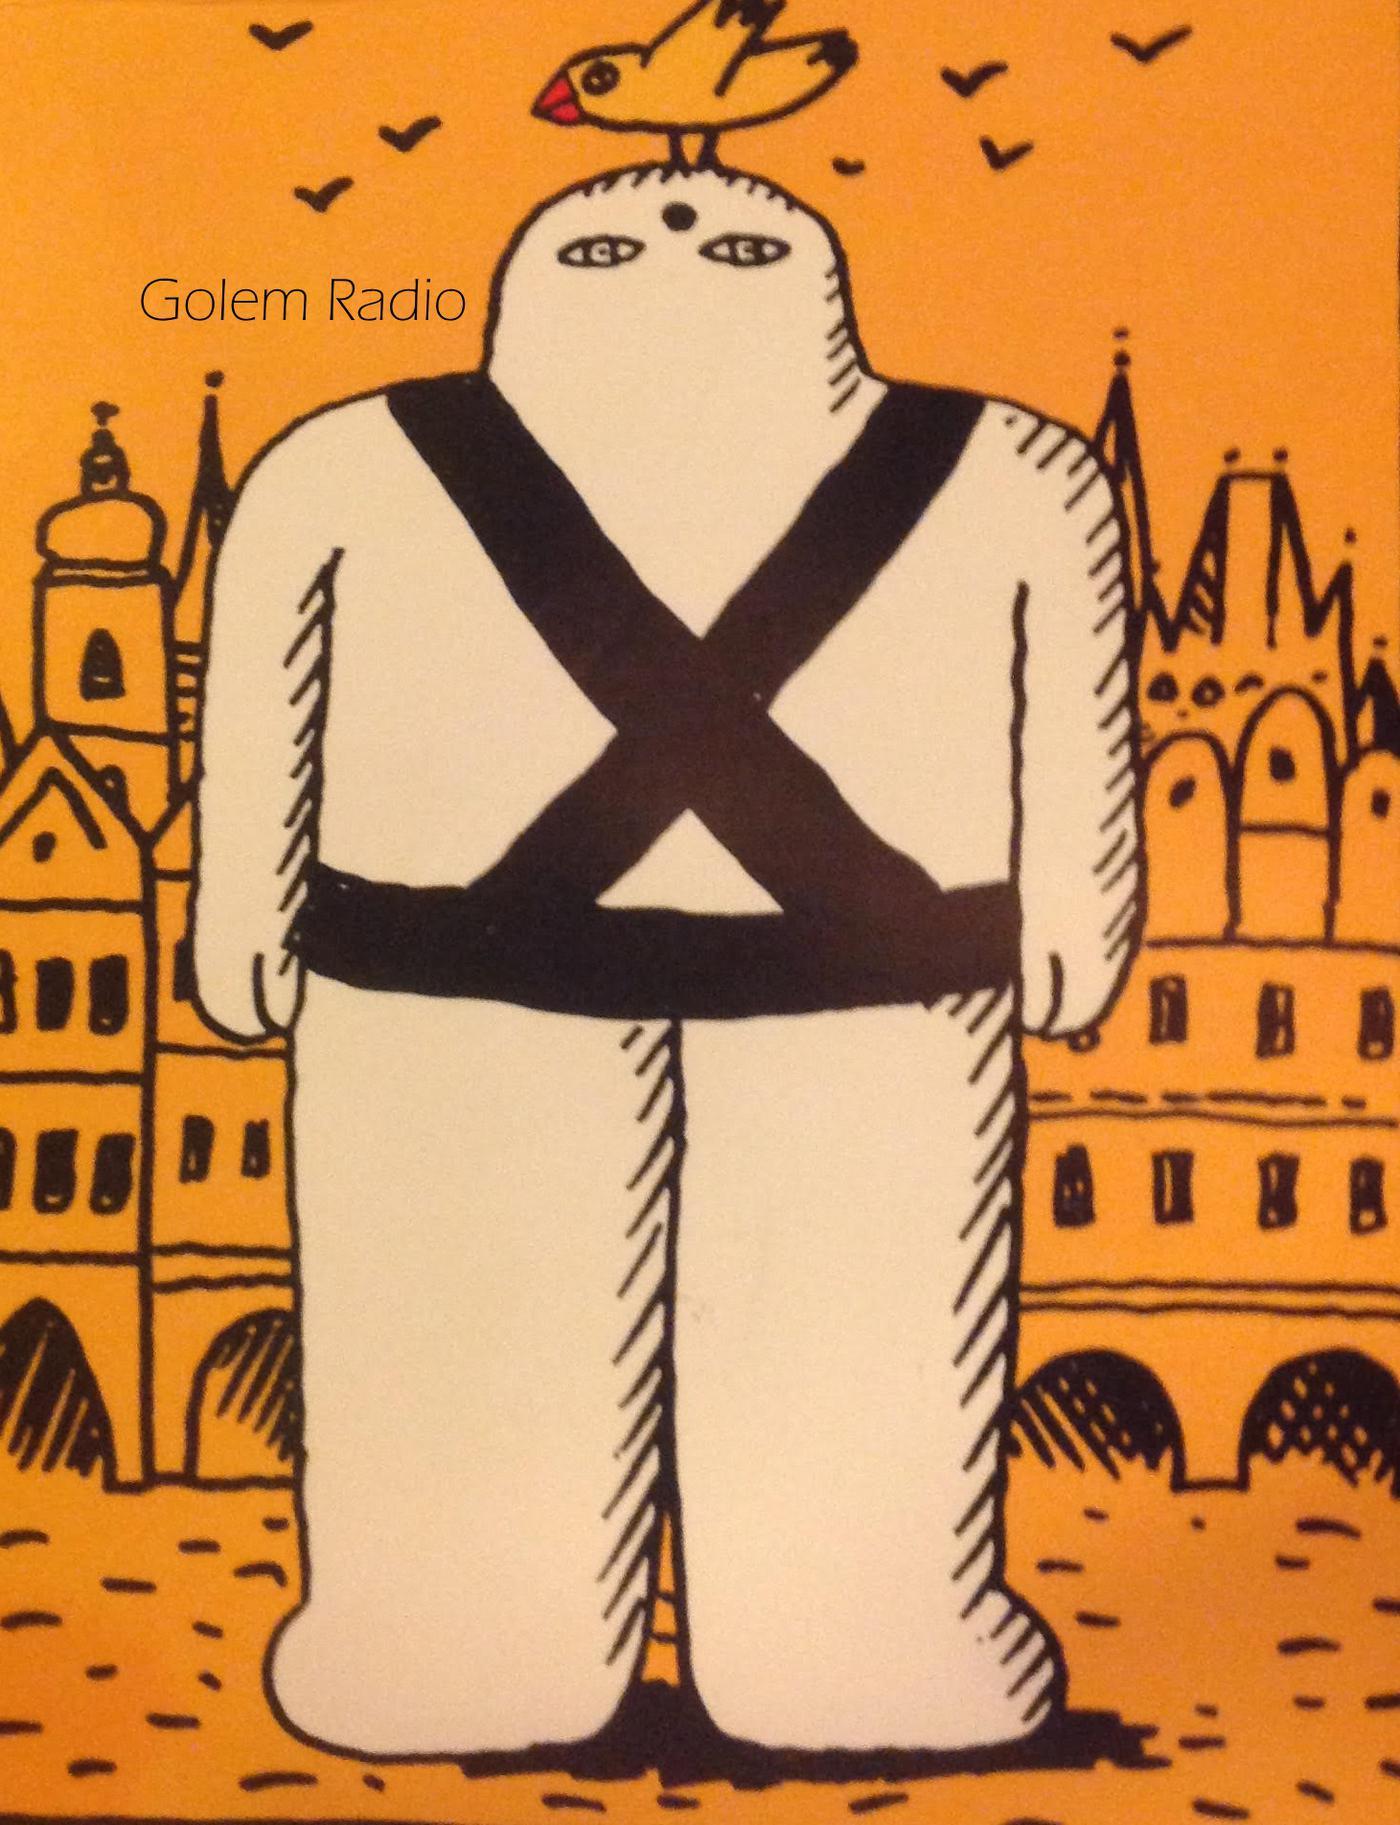 Golem Radio (podcast).